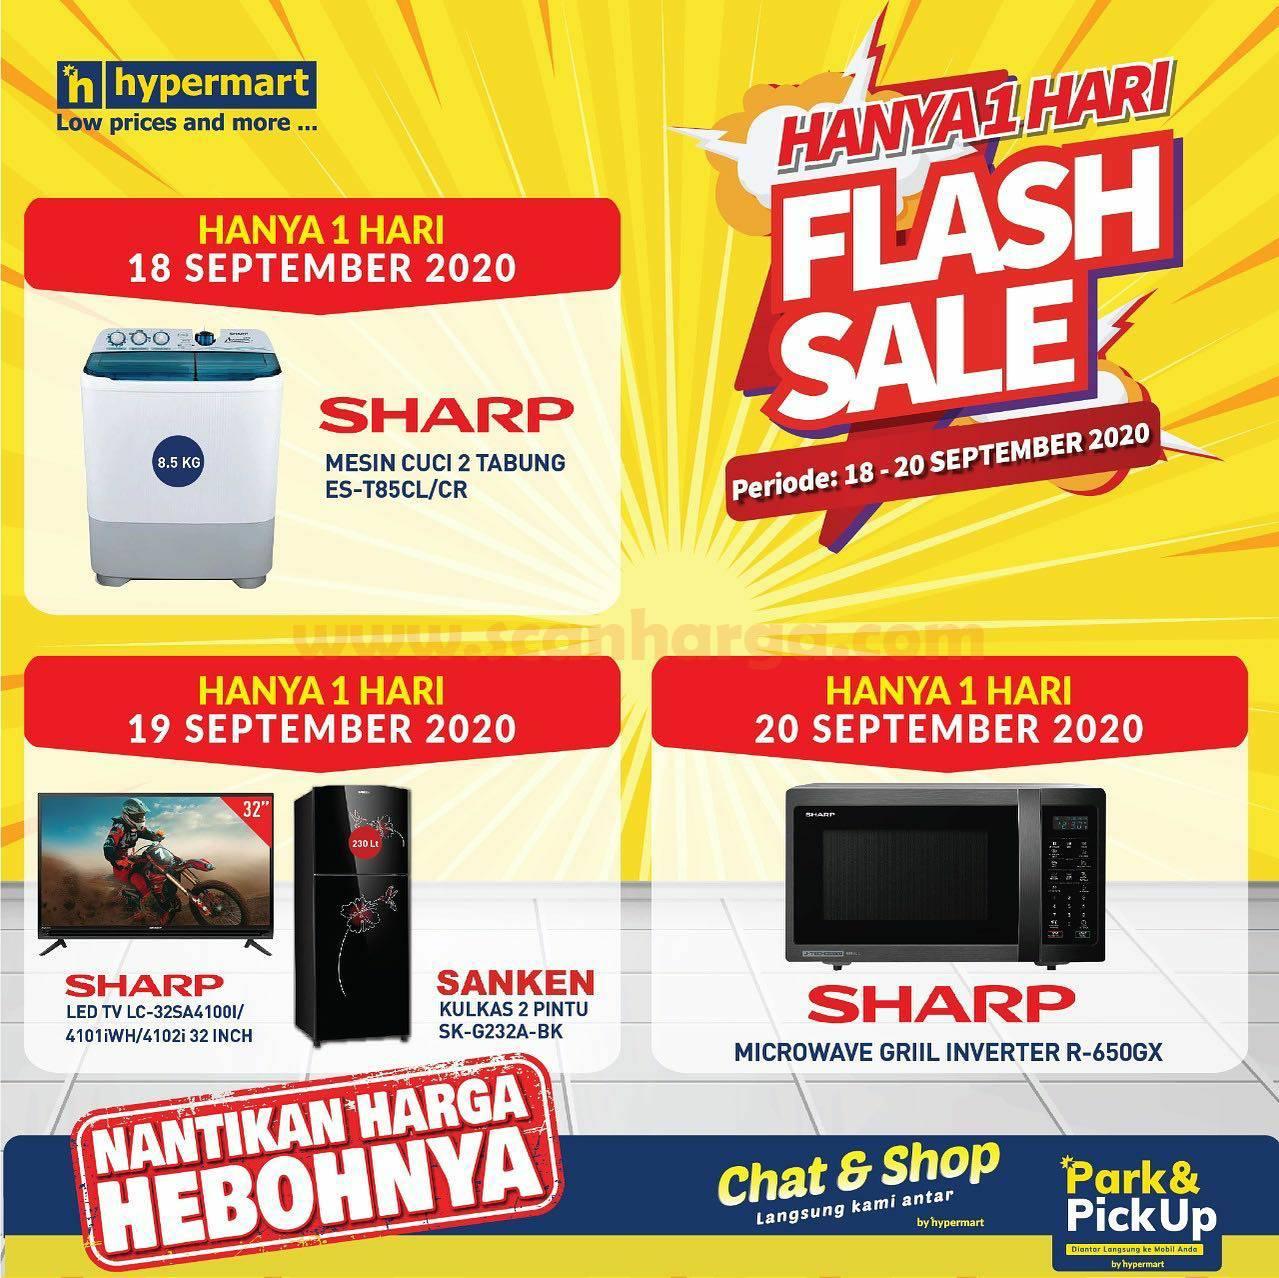 Promo Hypermart Flash Sale Spesial Elektronik Periode 18 - 20 September 2020